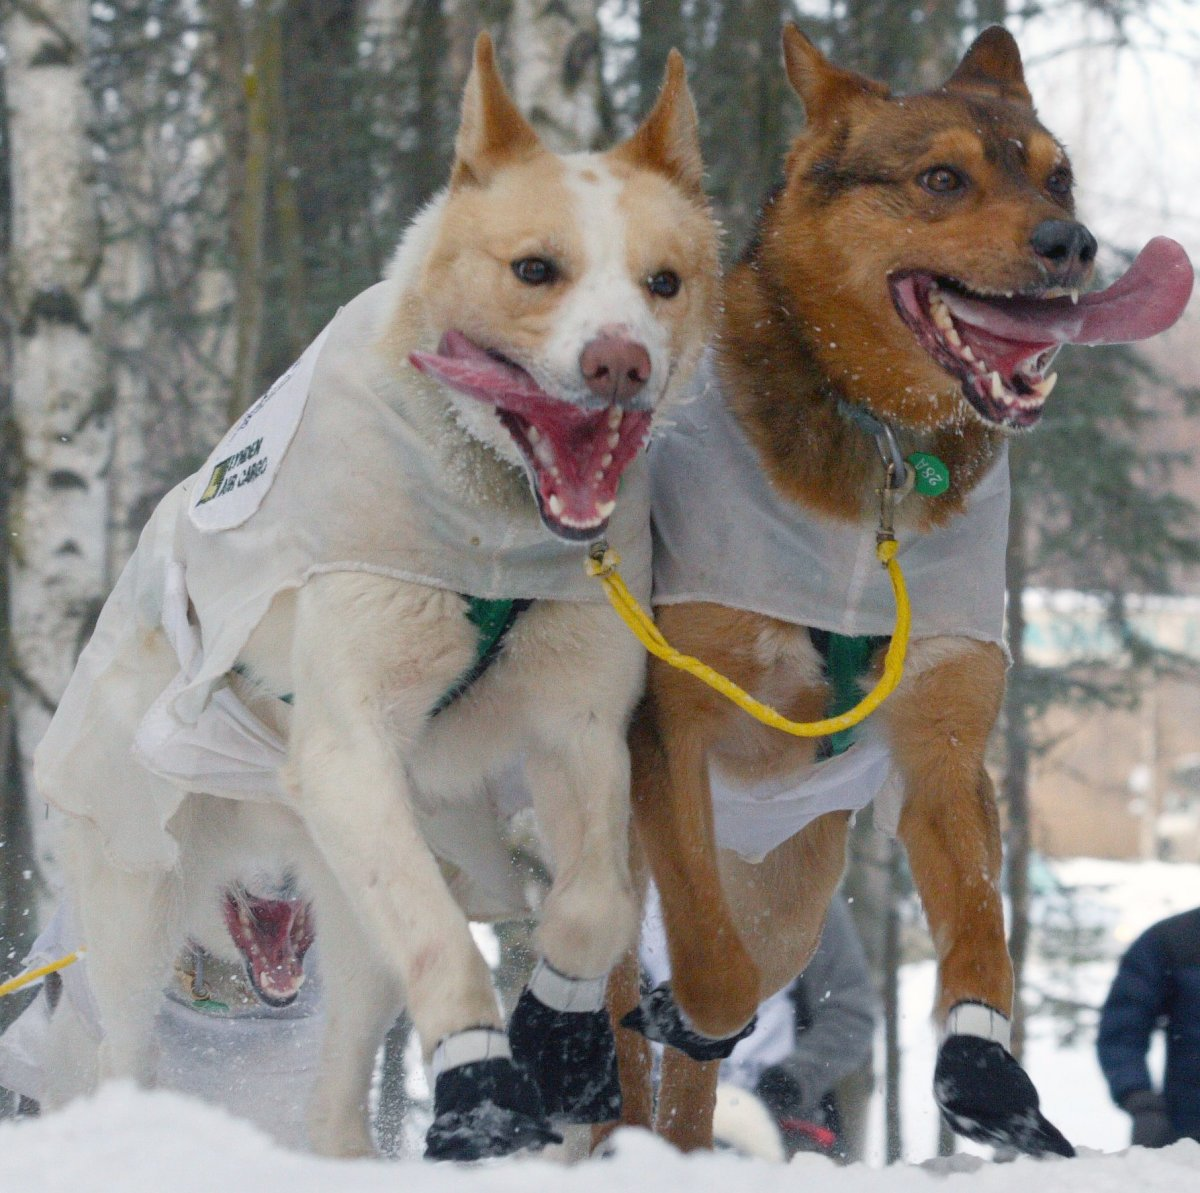 I love this photo of happy team pups.